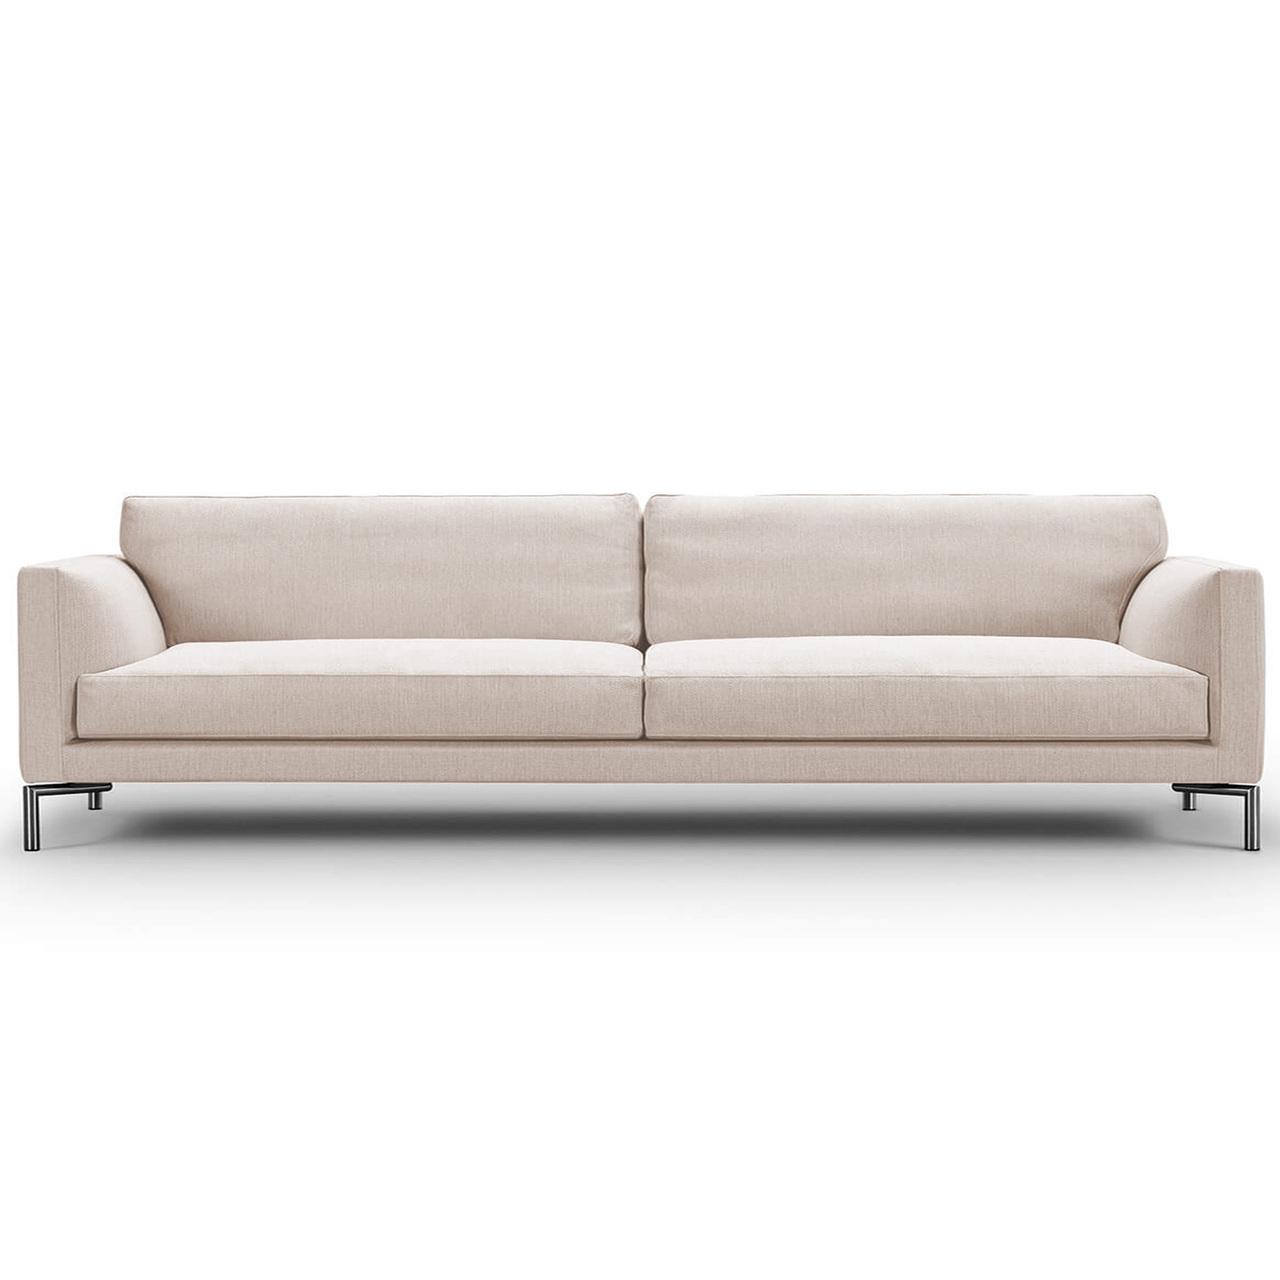 Eilersen Sofa Mission Seidengrau 57 - Sand, B: 240 cm, festsitzend